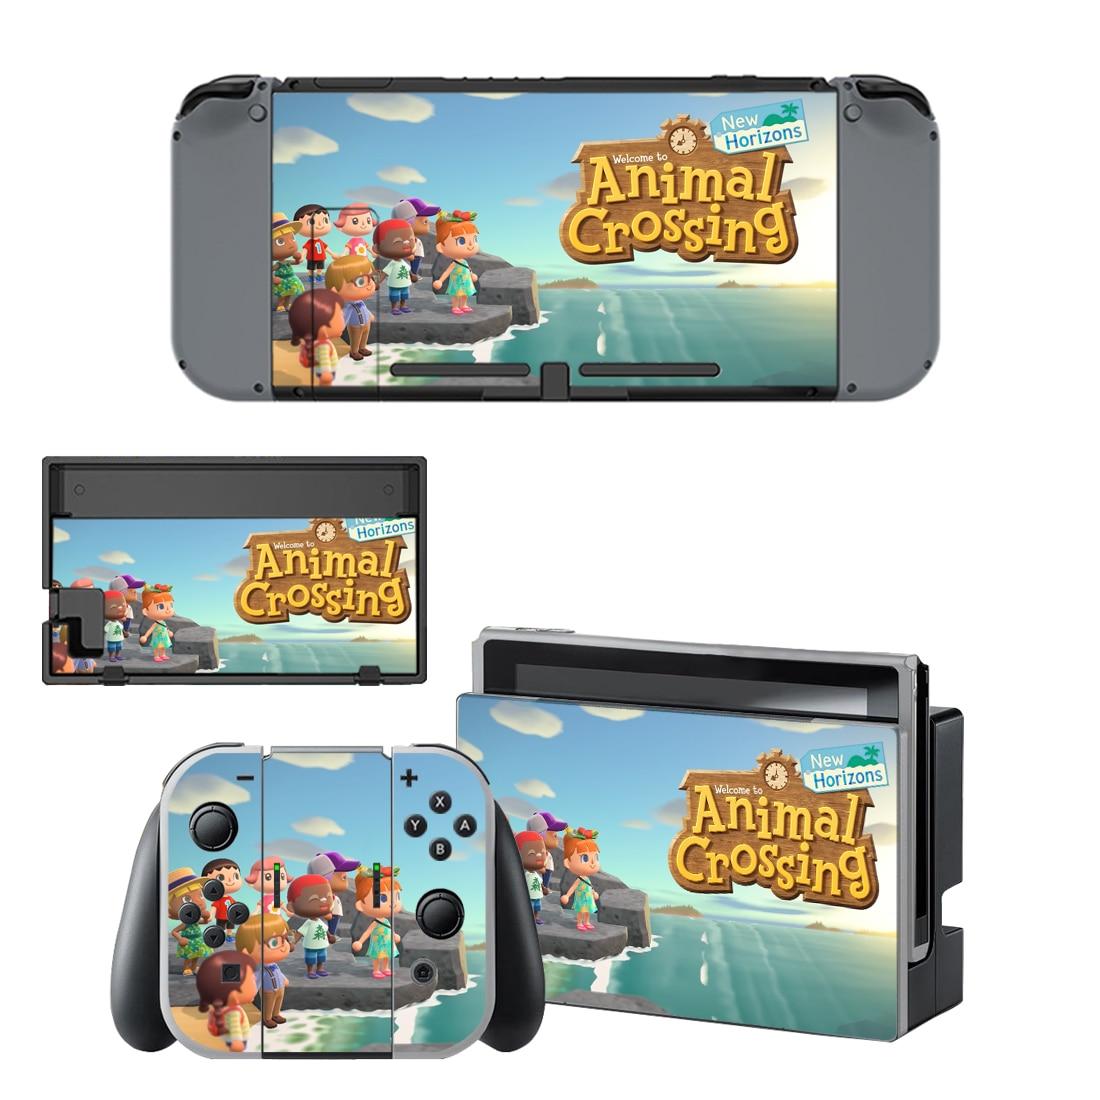 Vinyl Screen Skin Animal Crossing New Horizons Protector Sticker